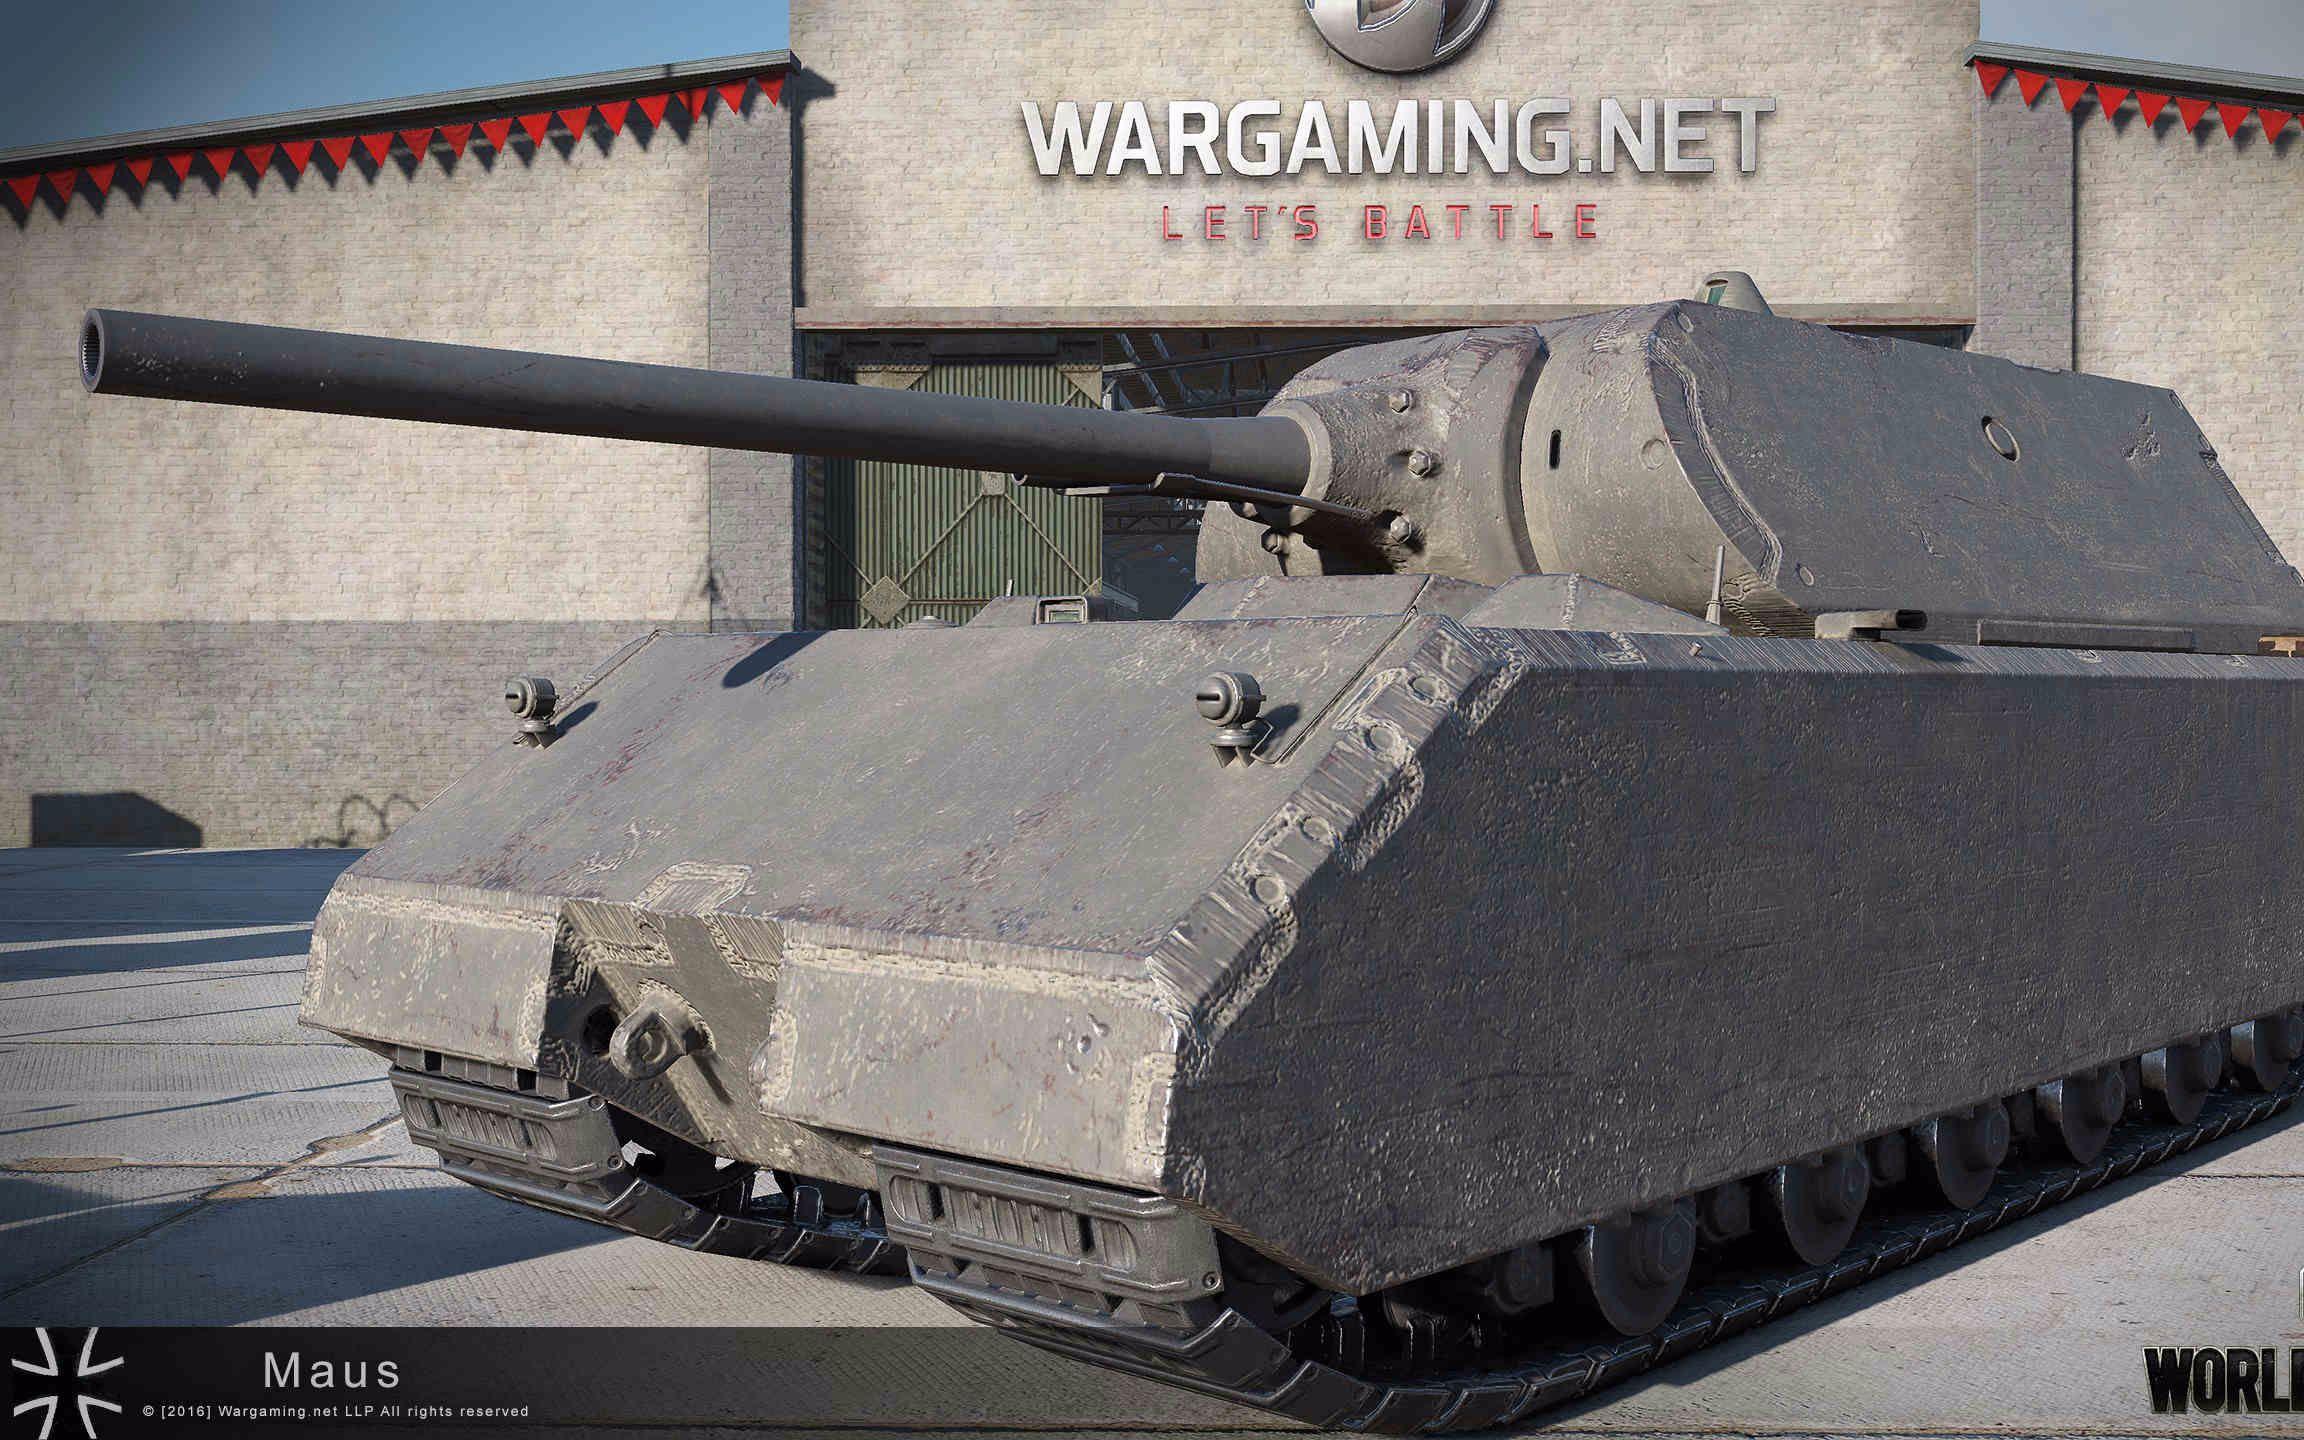 q6【水箱组/双语】德意志玄幻作【鼠式超重型坦克】保时捷博士出品